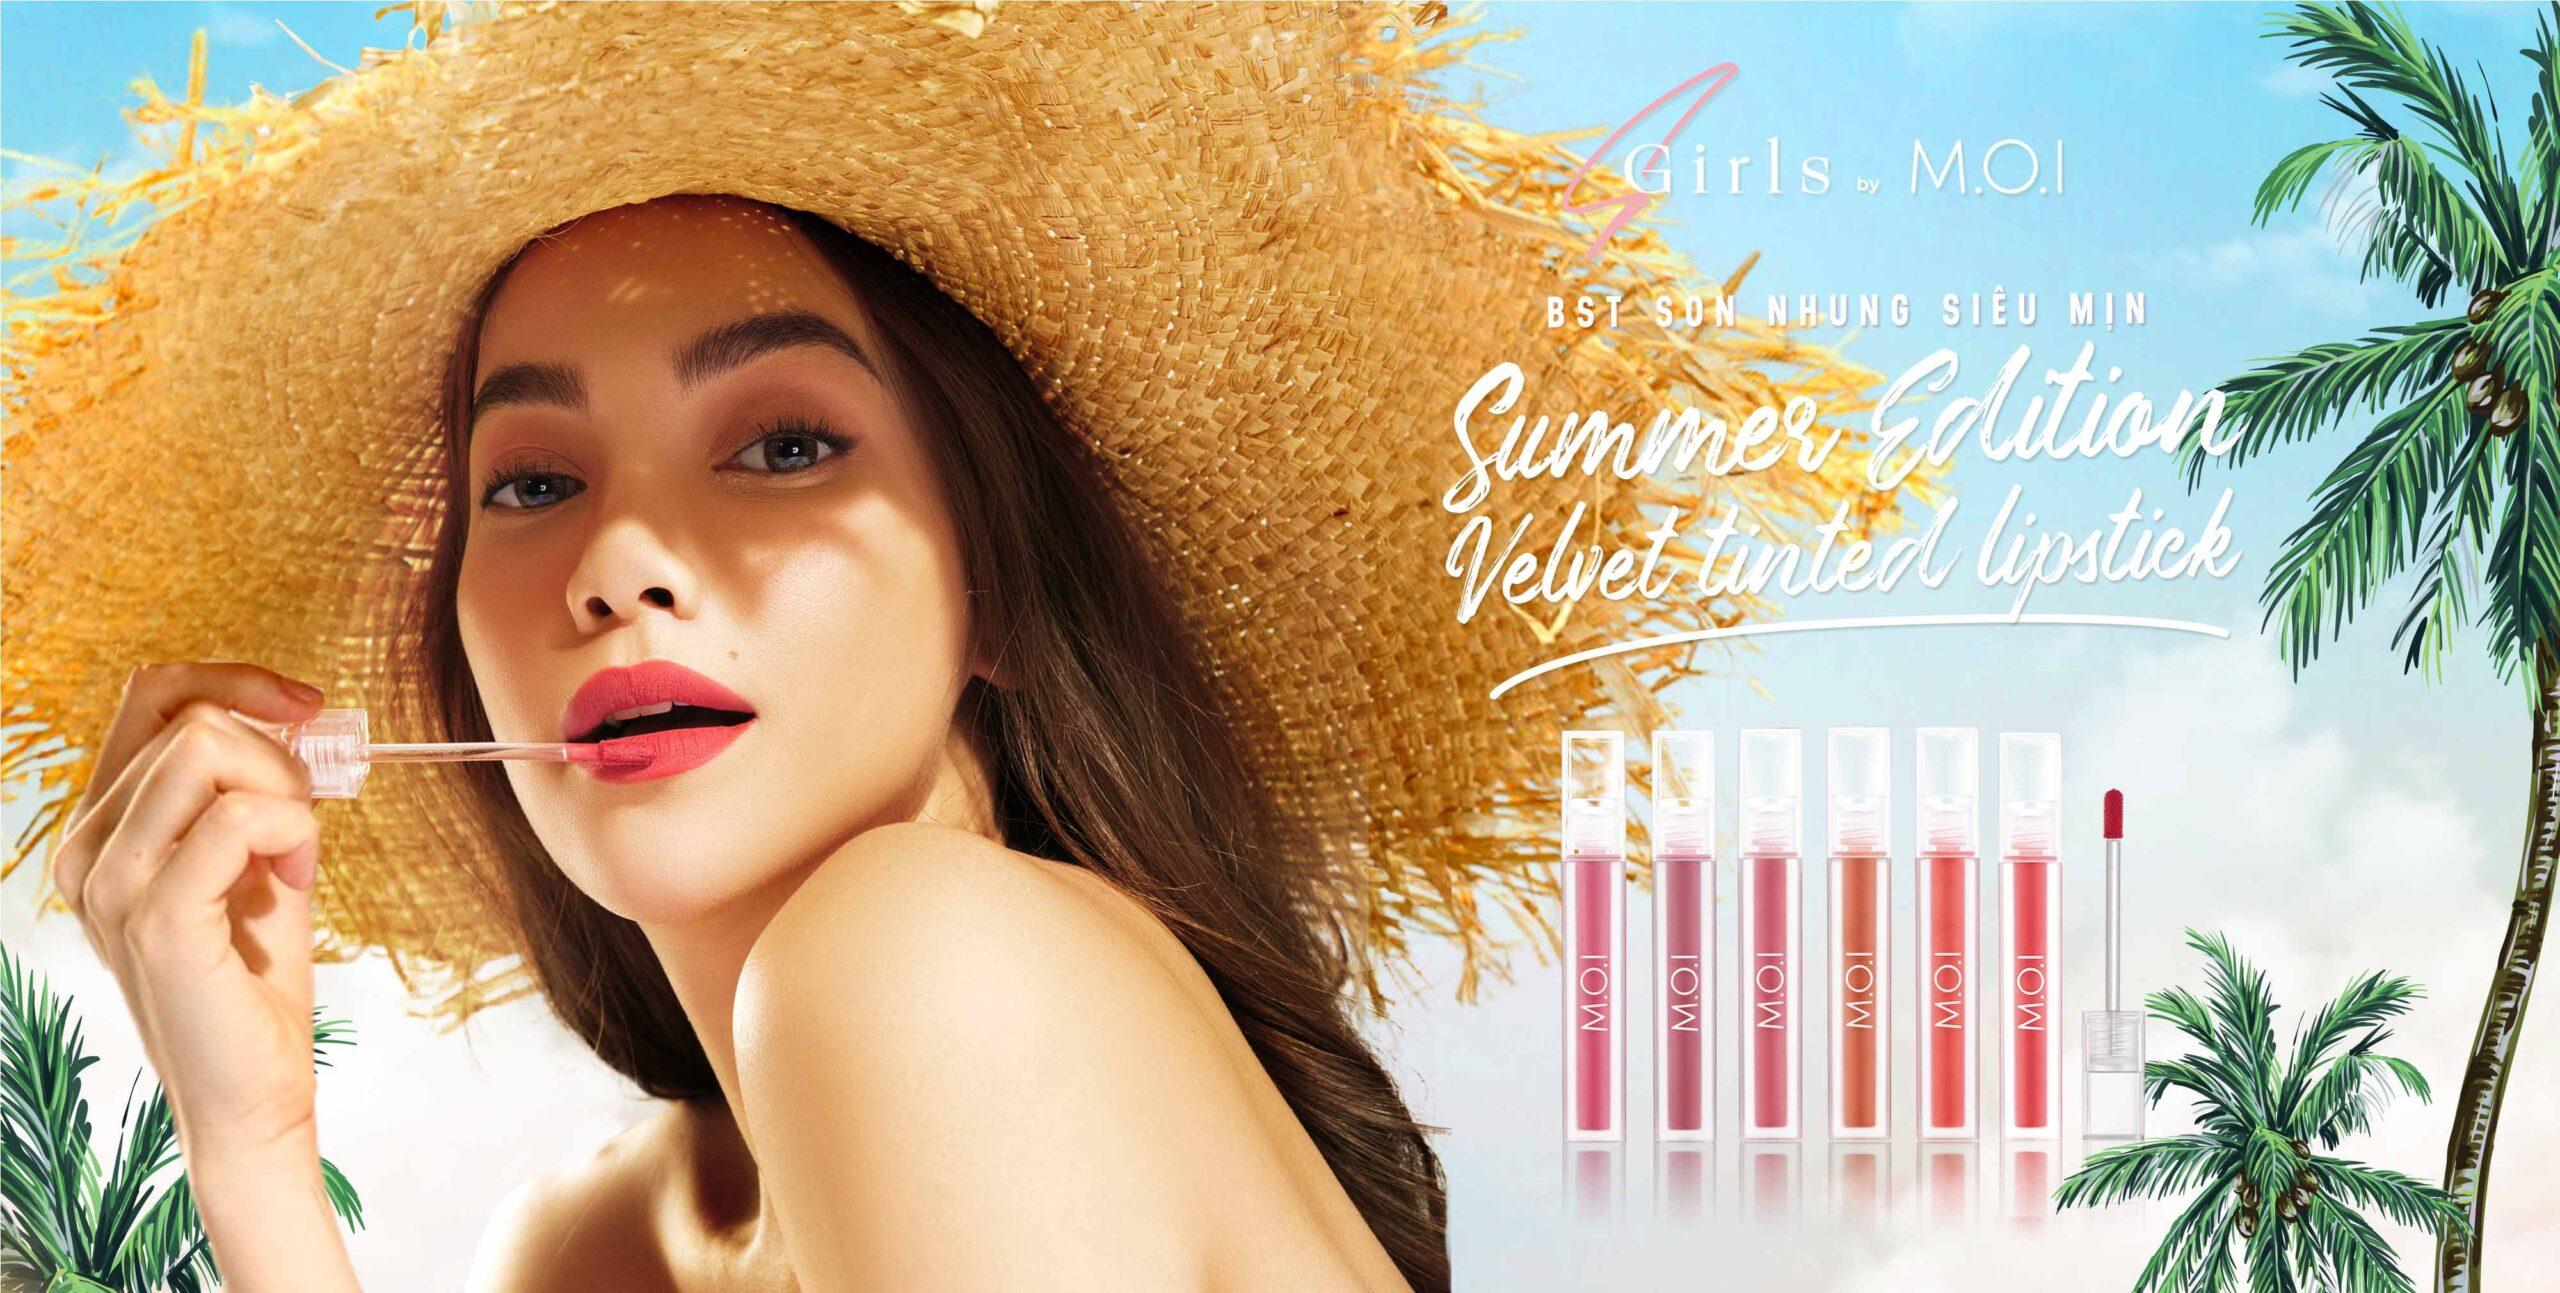 sgirls-summer-edition-moi-ho-ngoc-ha